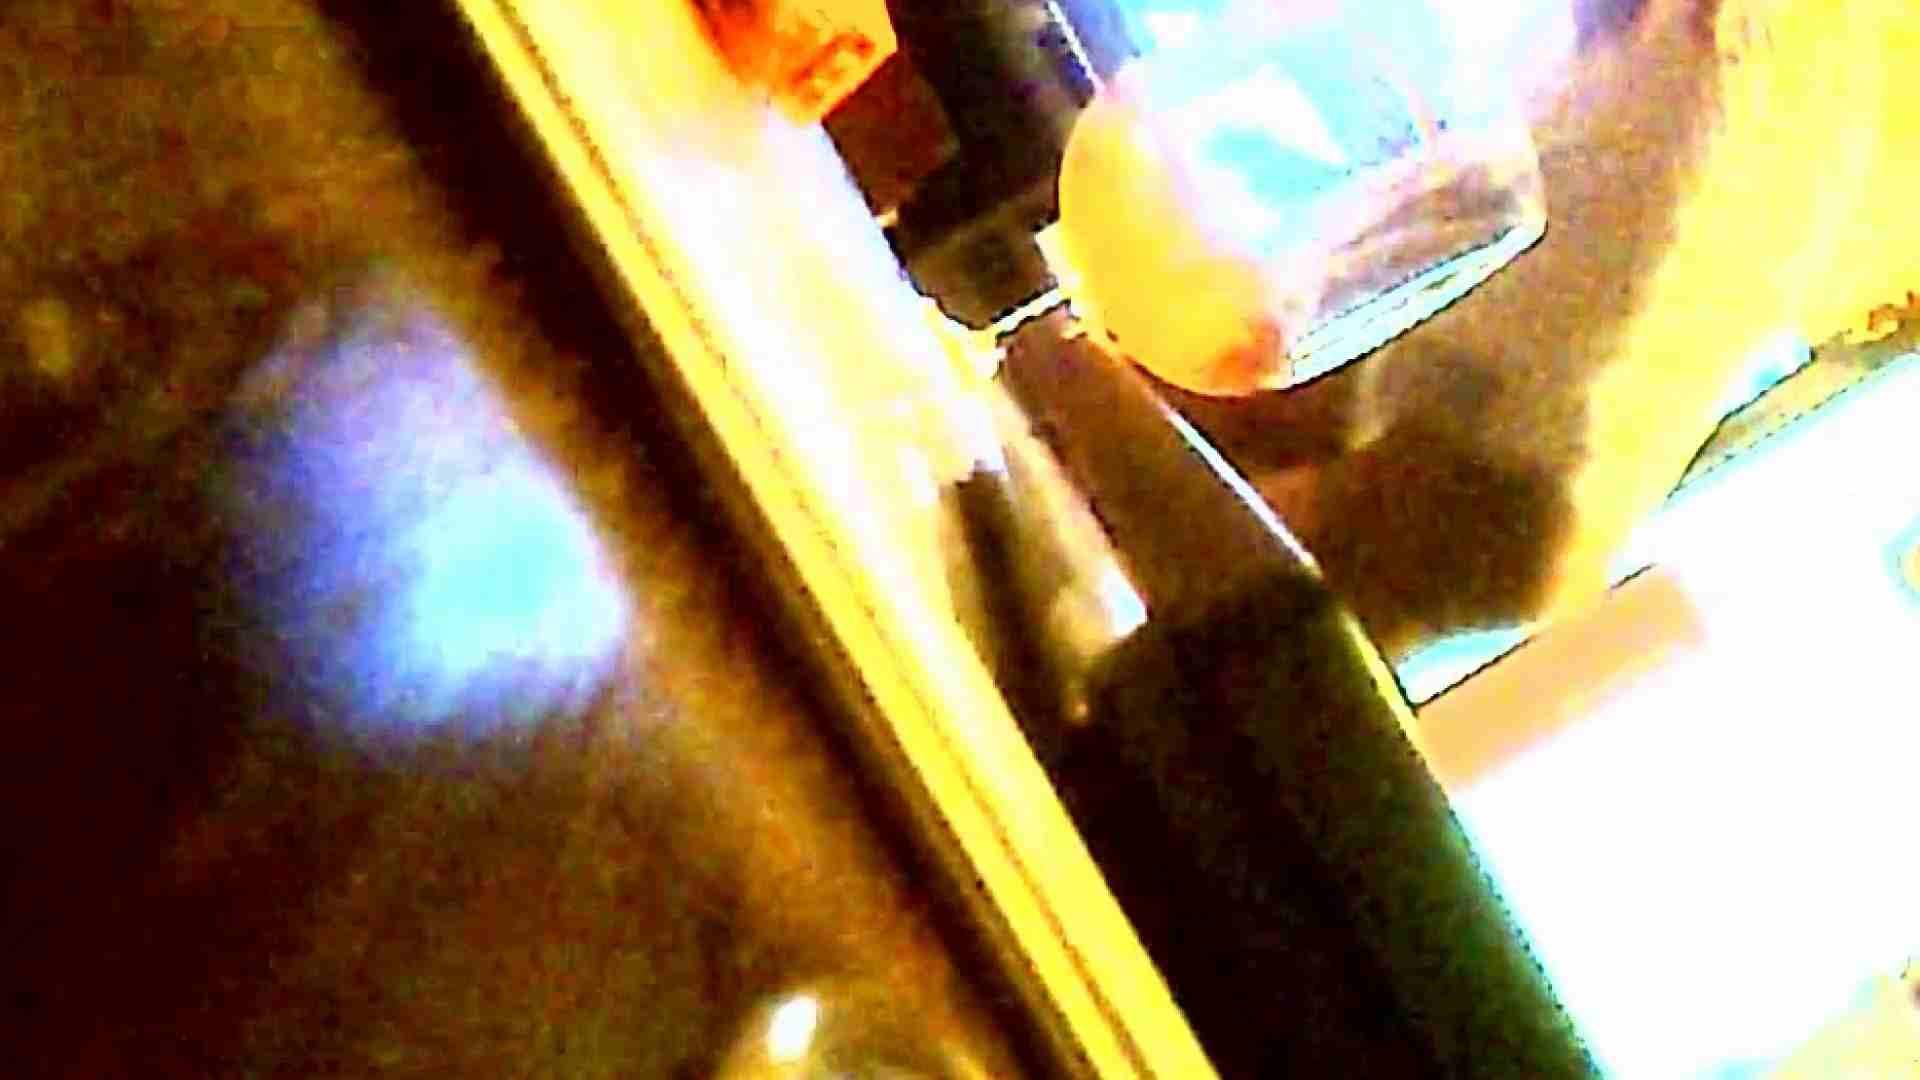 ▲2017_05位▲ 学園アイドル美人女子大生!❶4人厳選詰合せVol.49 人気作   女子大生  113画像 40